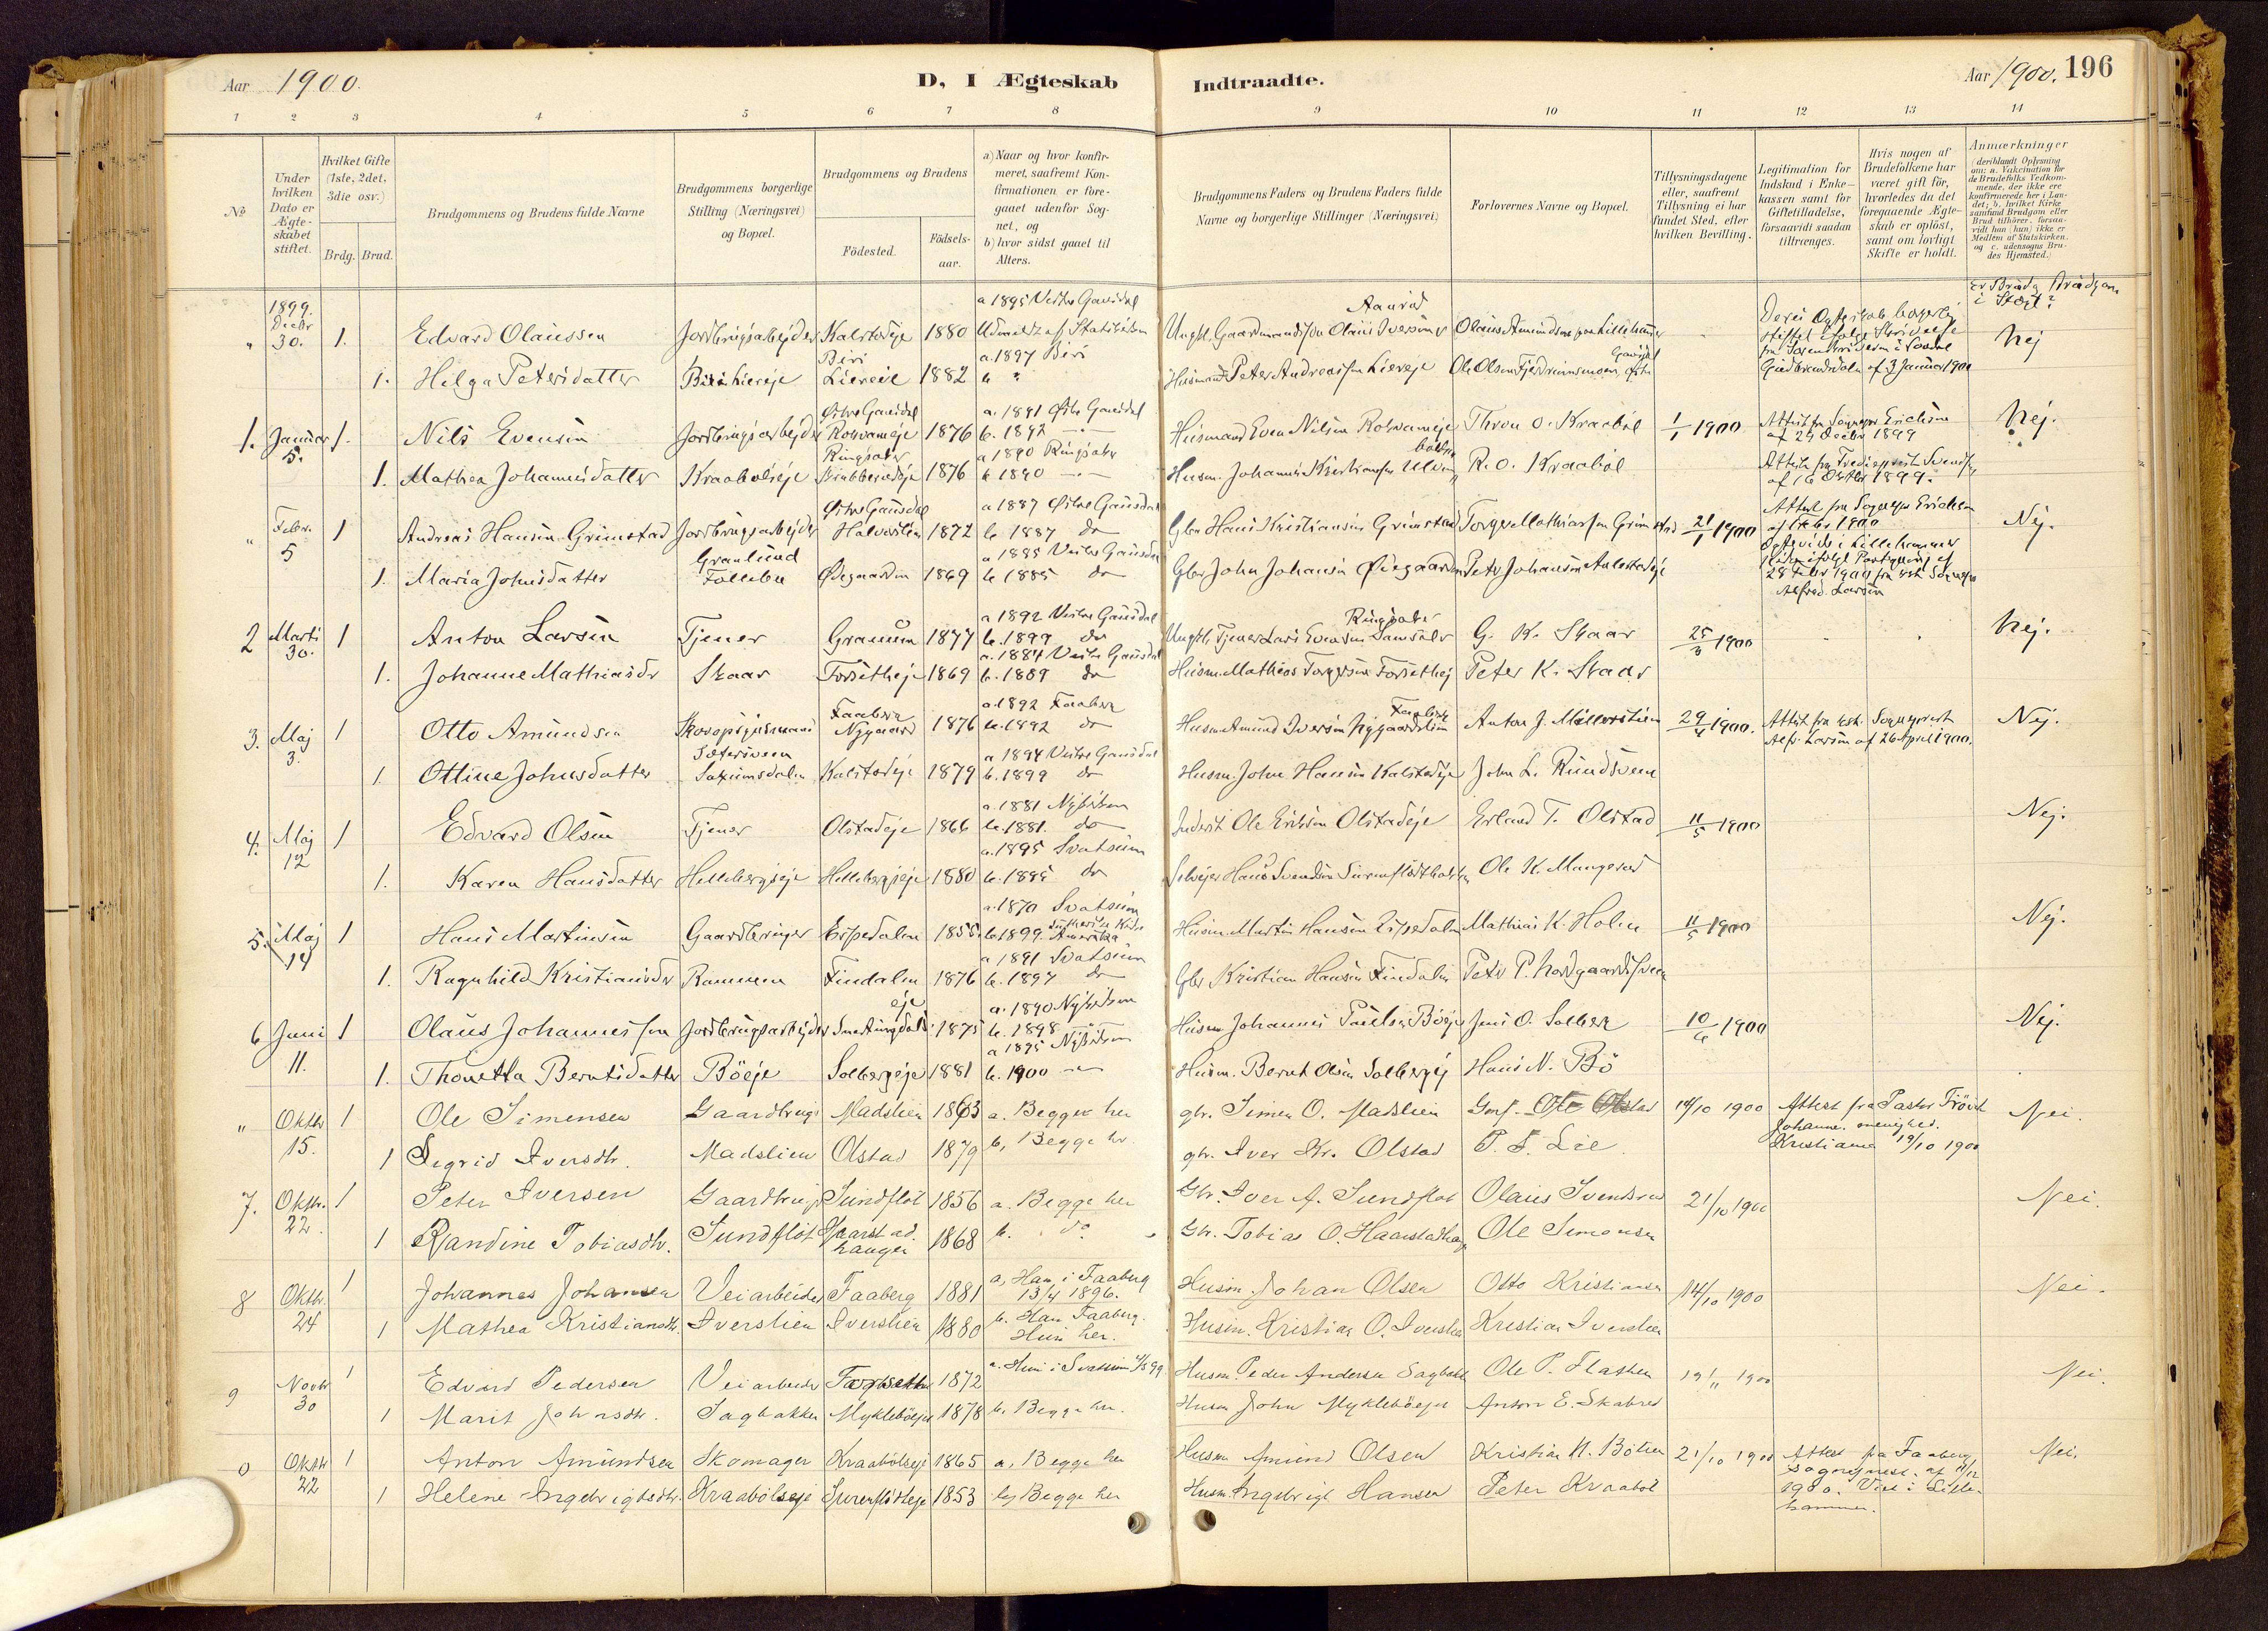 SAH, Vestre Gausdal prestekontor, Ministerialbok nr. 1, 1887-1914, s. 196